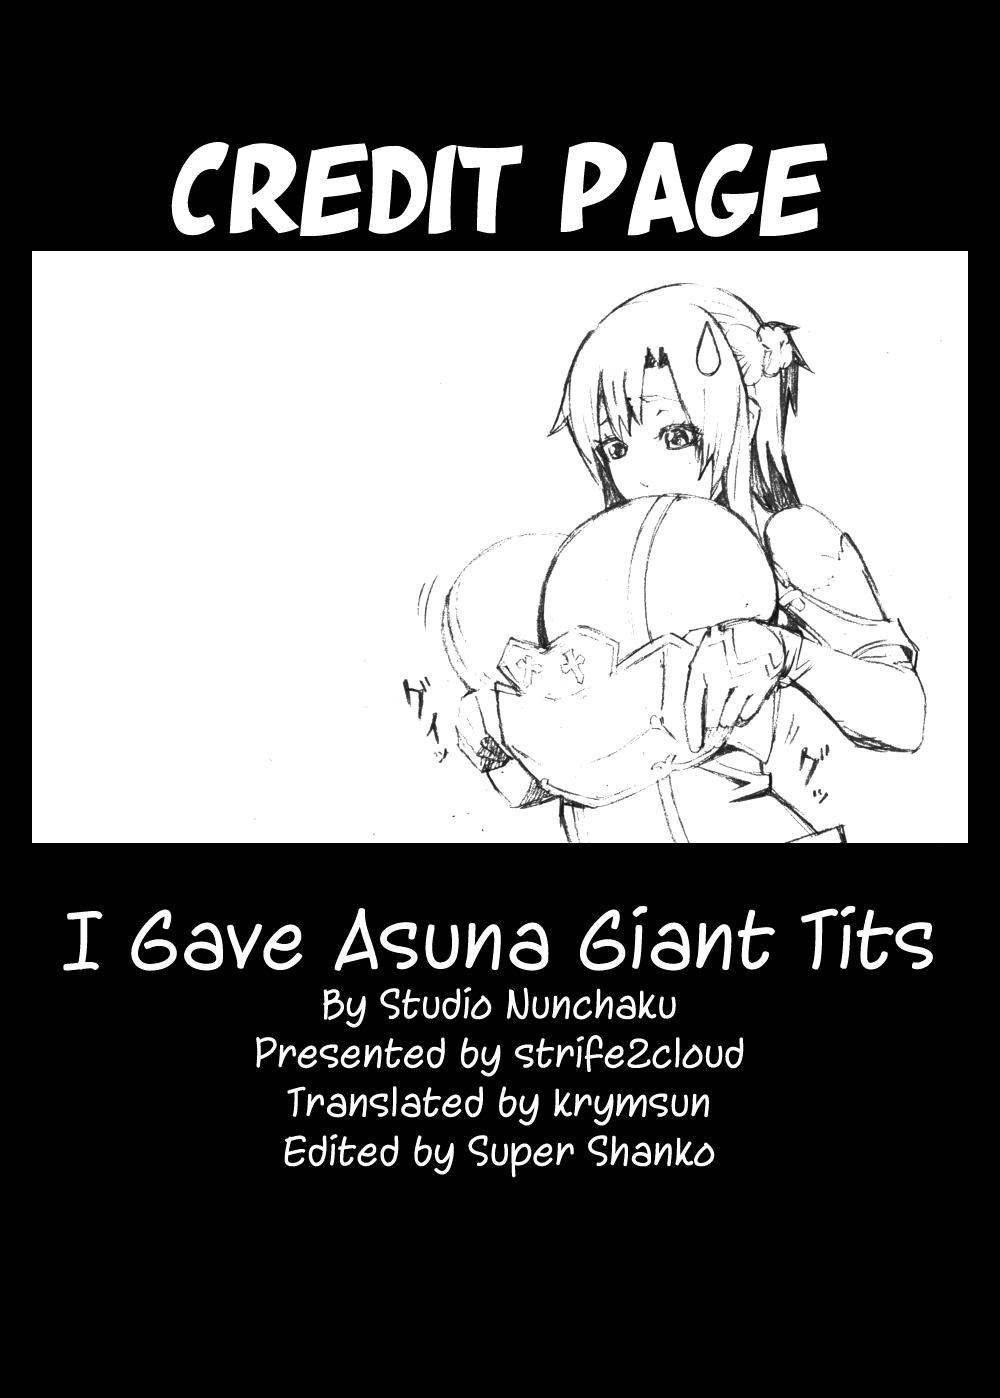 Asuna o Bakunyuu ni Shite Mita | I Gave Asuna Giant Tits 26